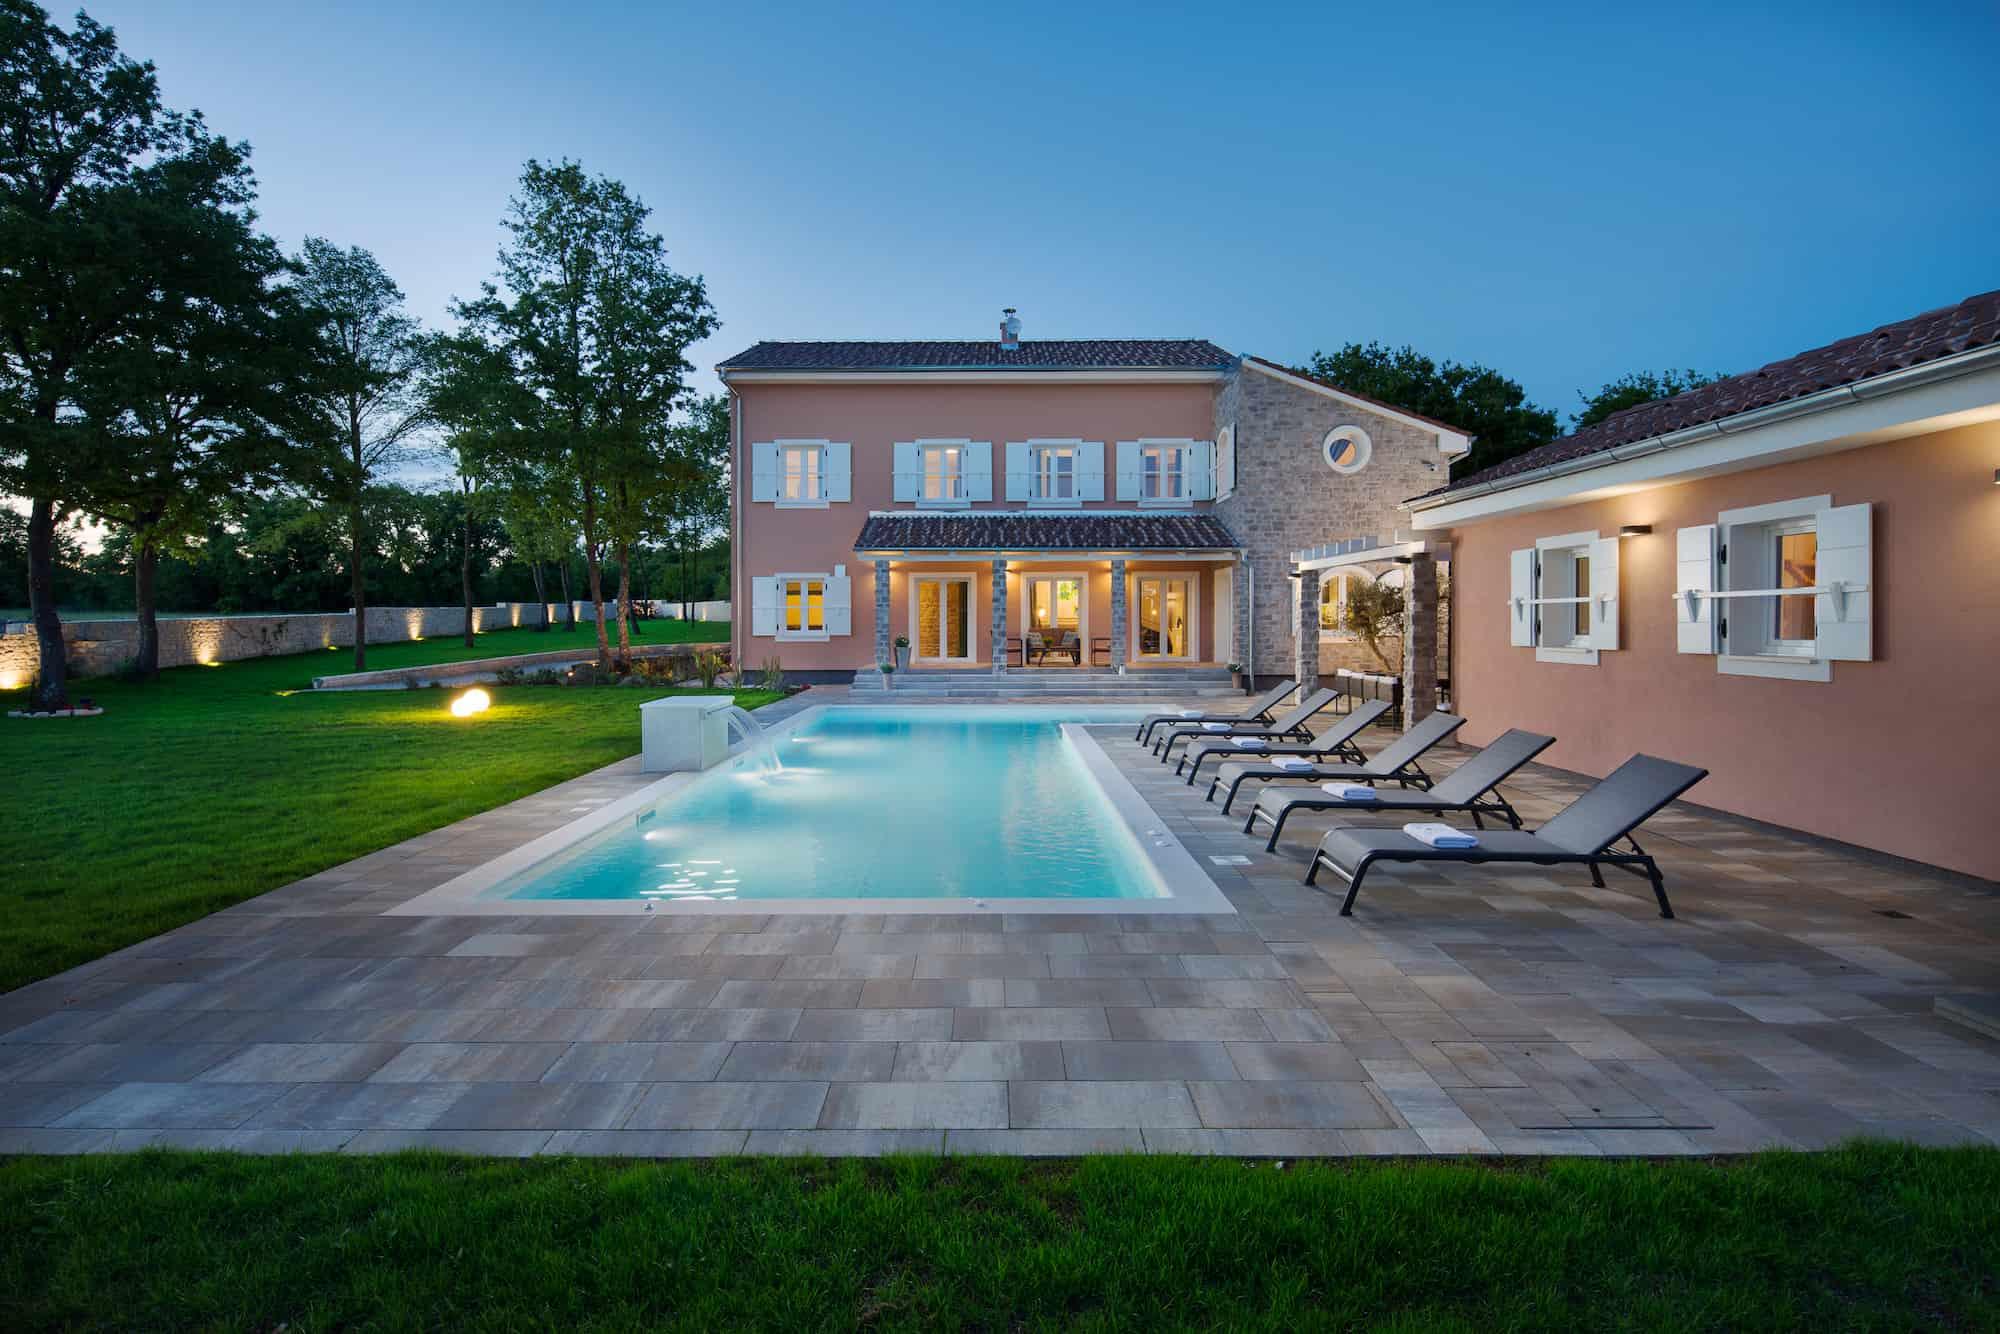 Super luksuzna vila s bazenom i vinskim podrumom